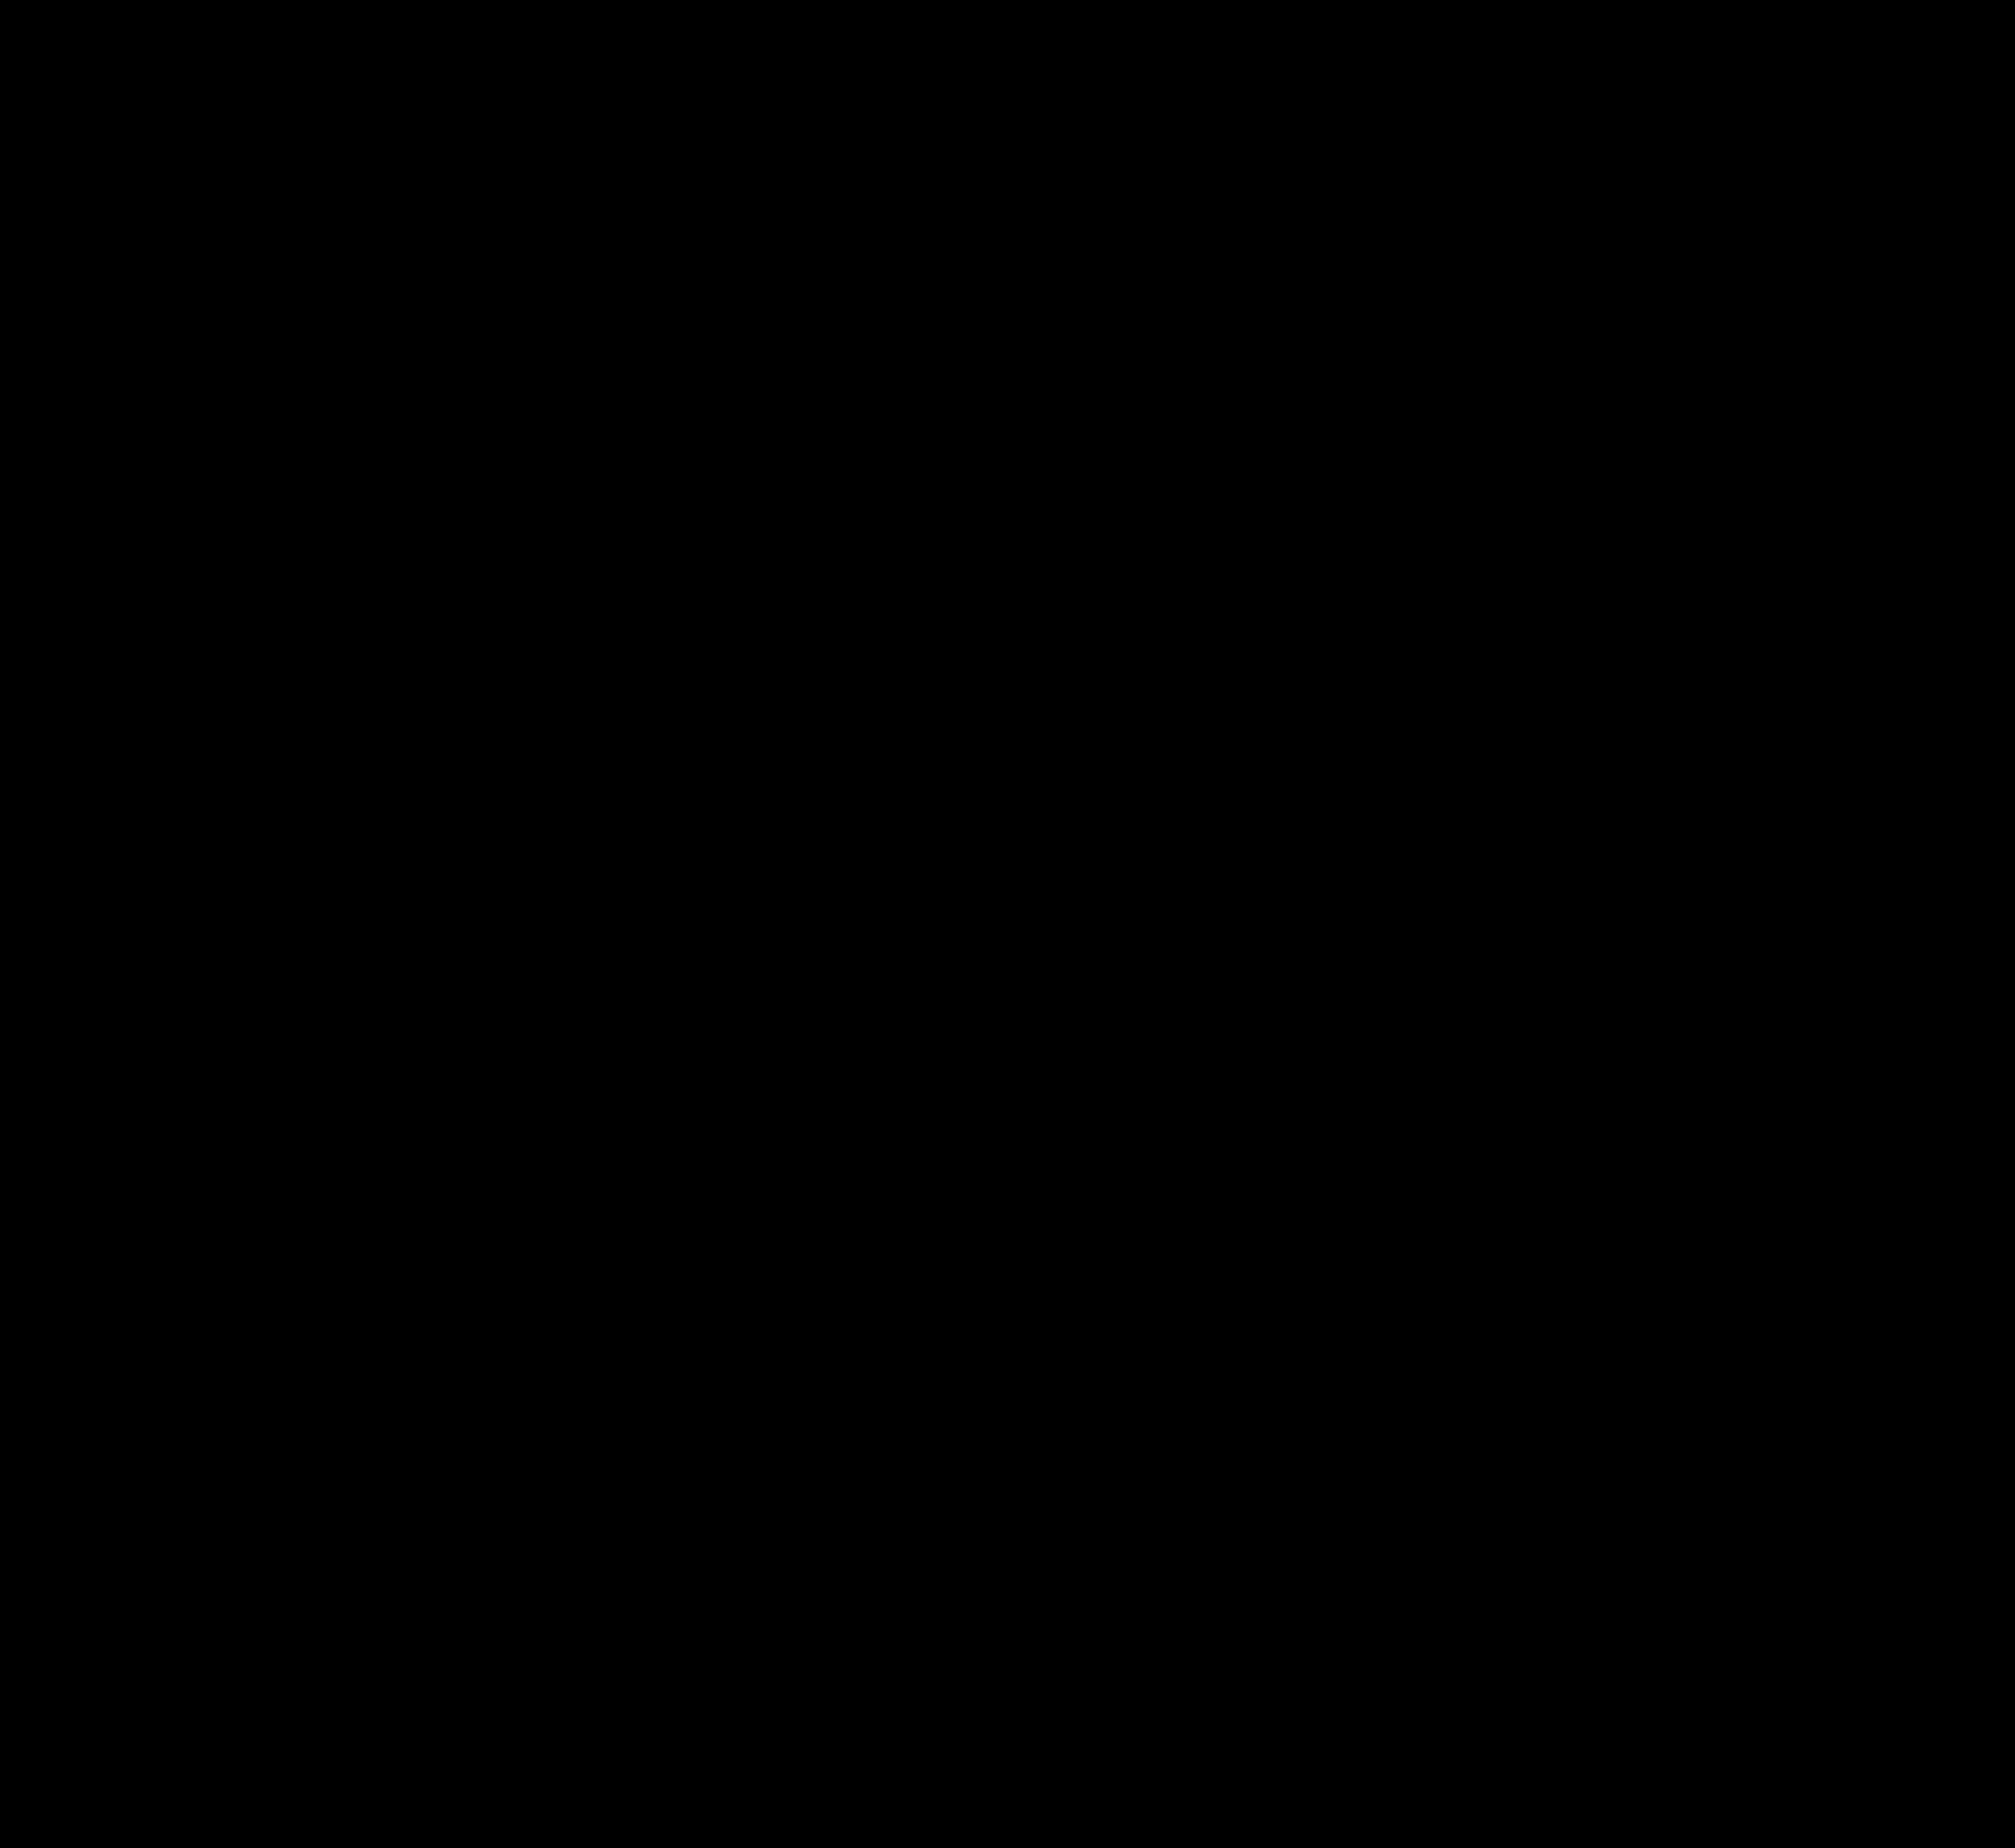 Wildcat dog paw clip. Pawprint clipart transparent background